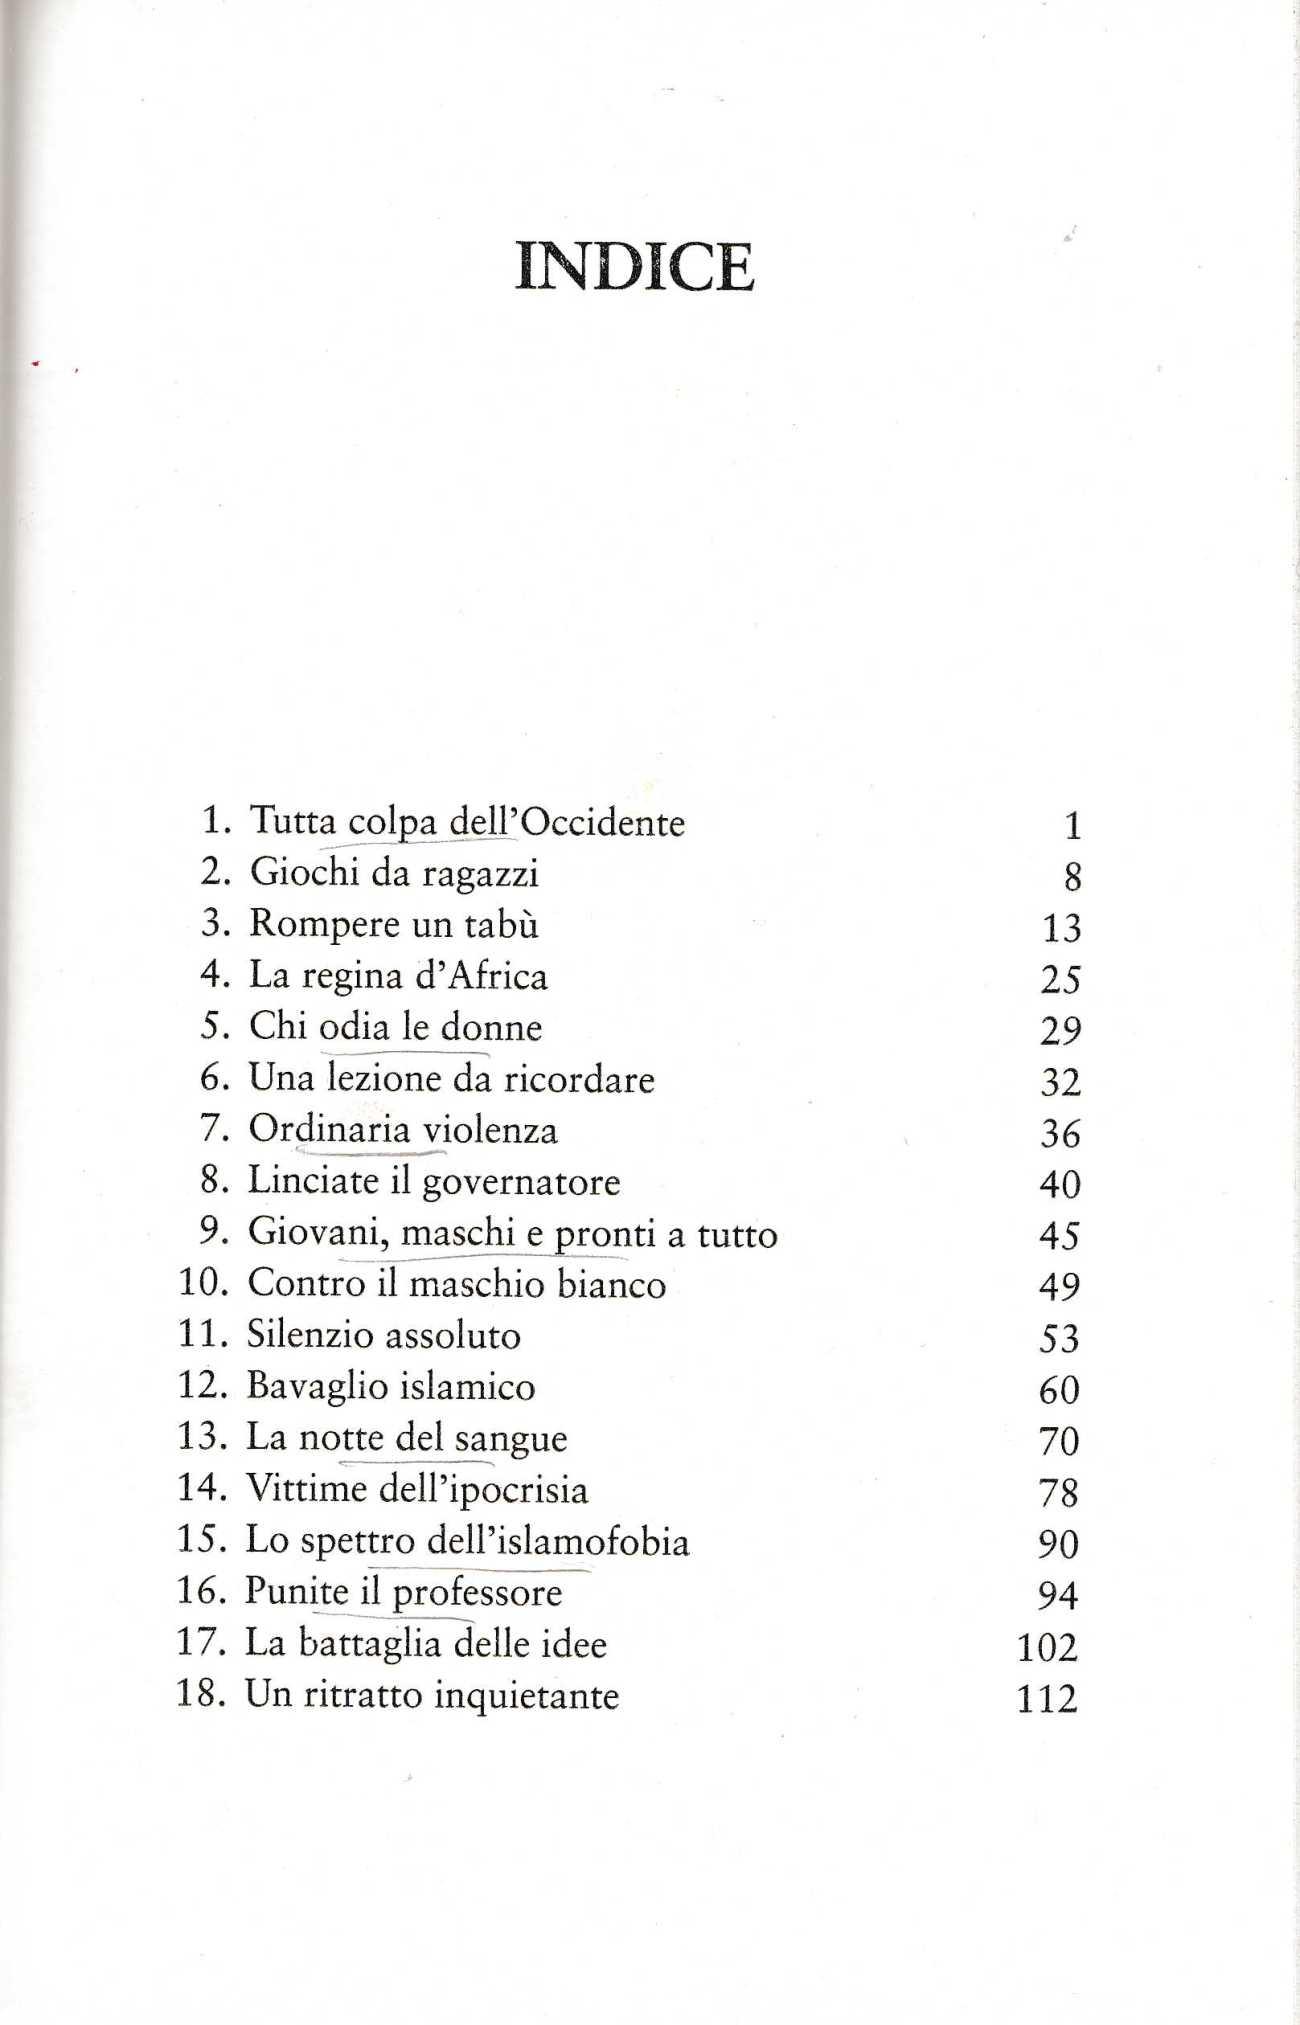 ISLAMOFOLLIA2514